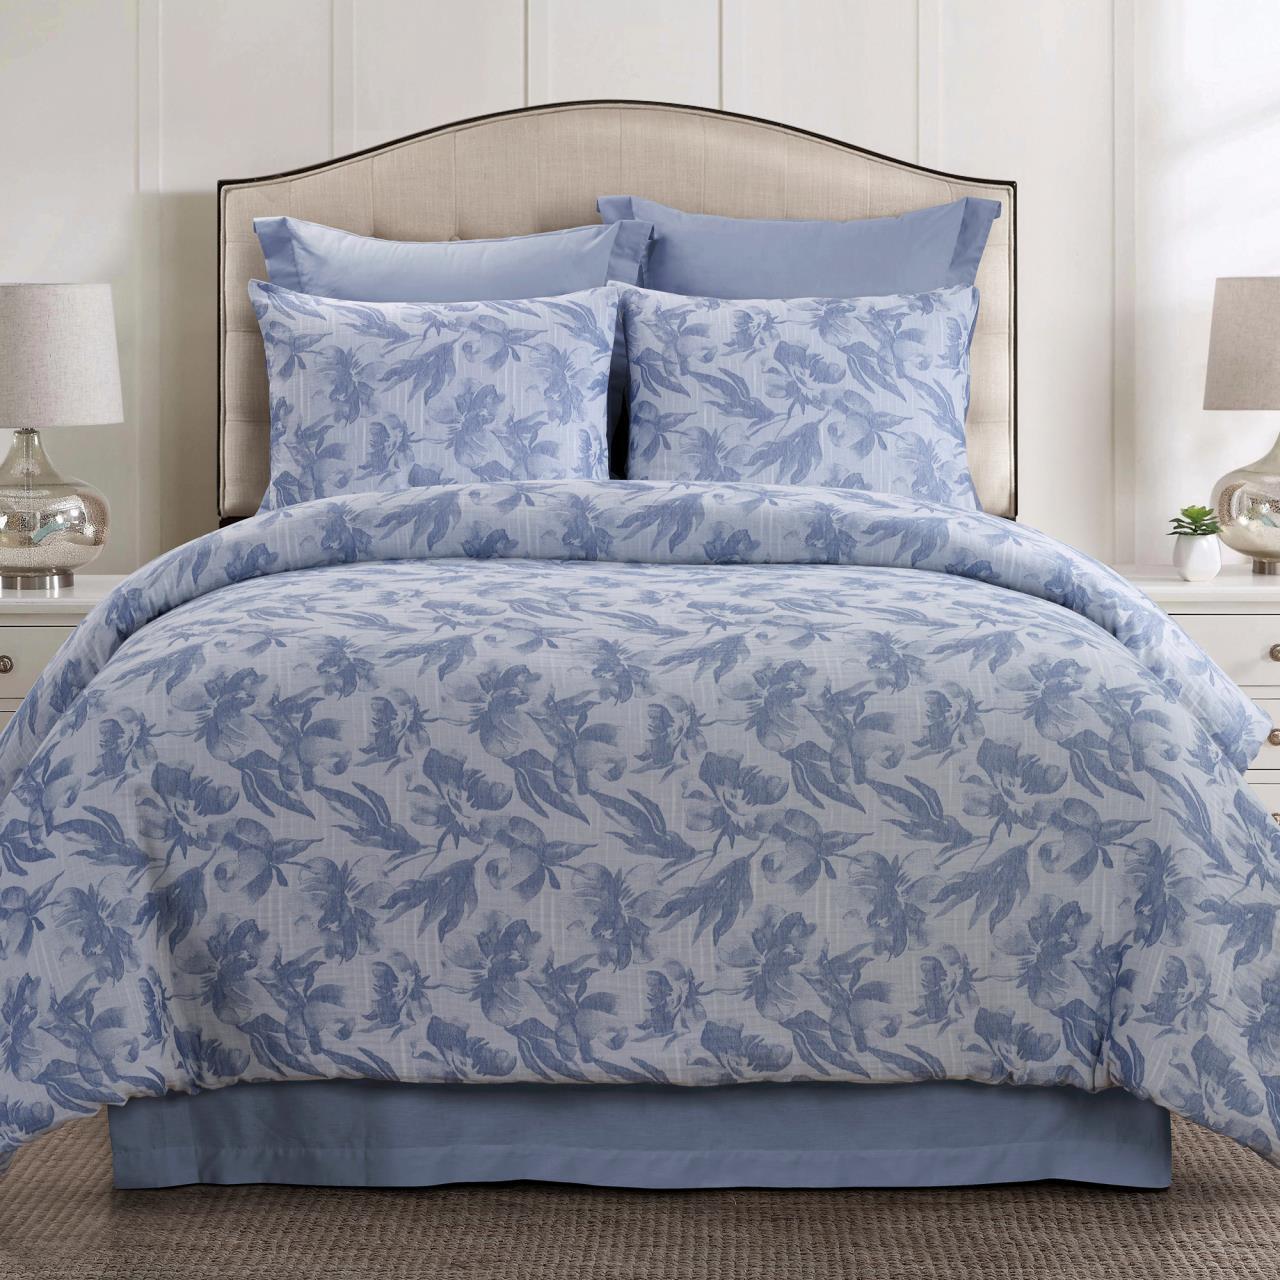 Almaria Soft Blue Comforter Set - 754069006380